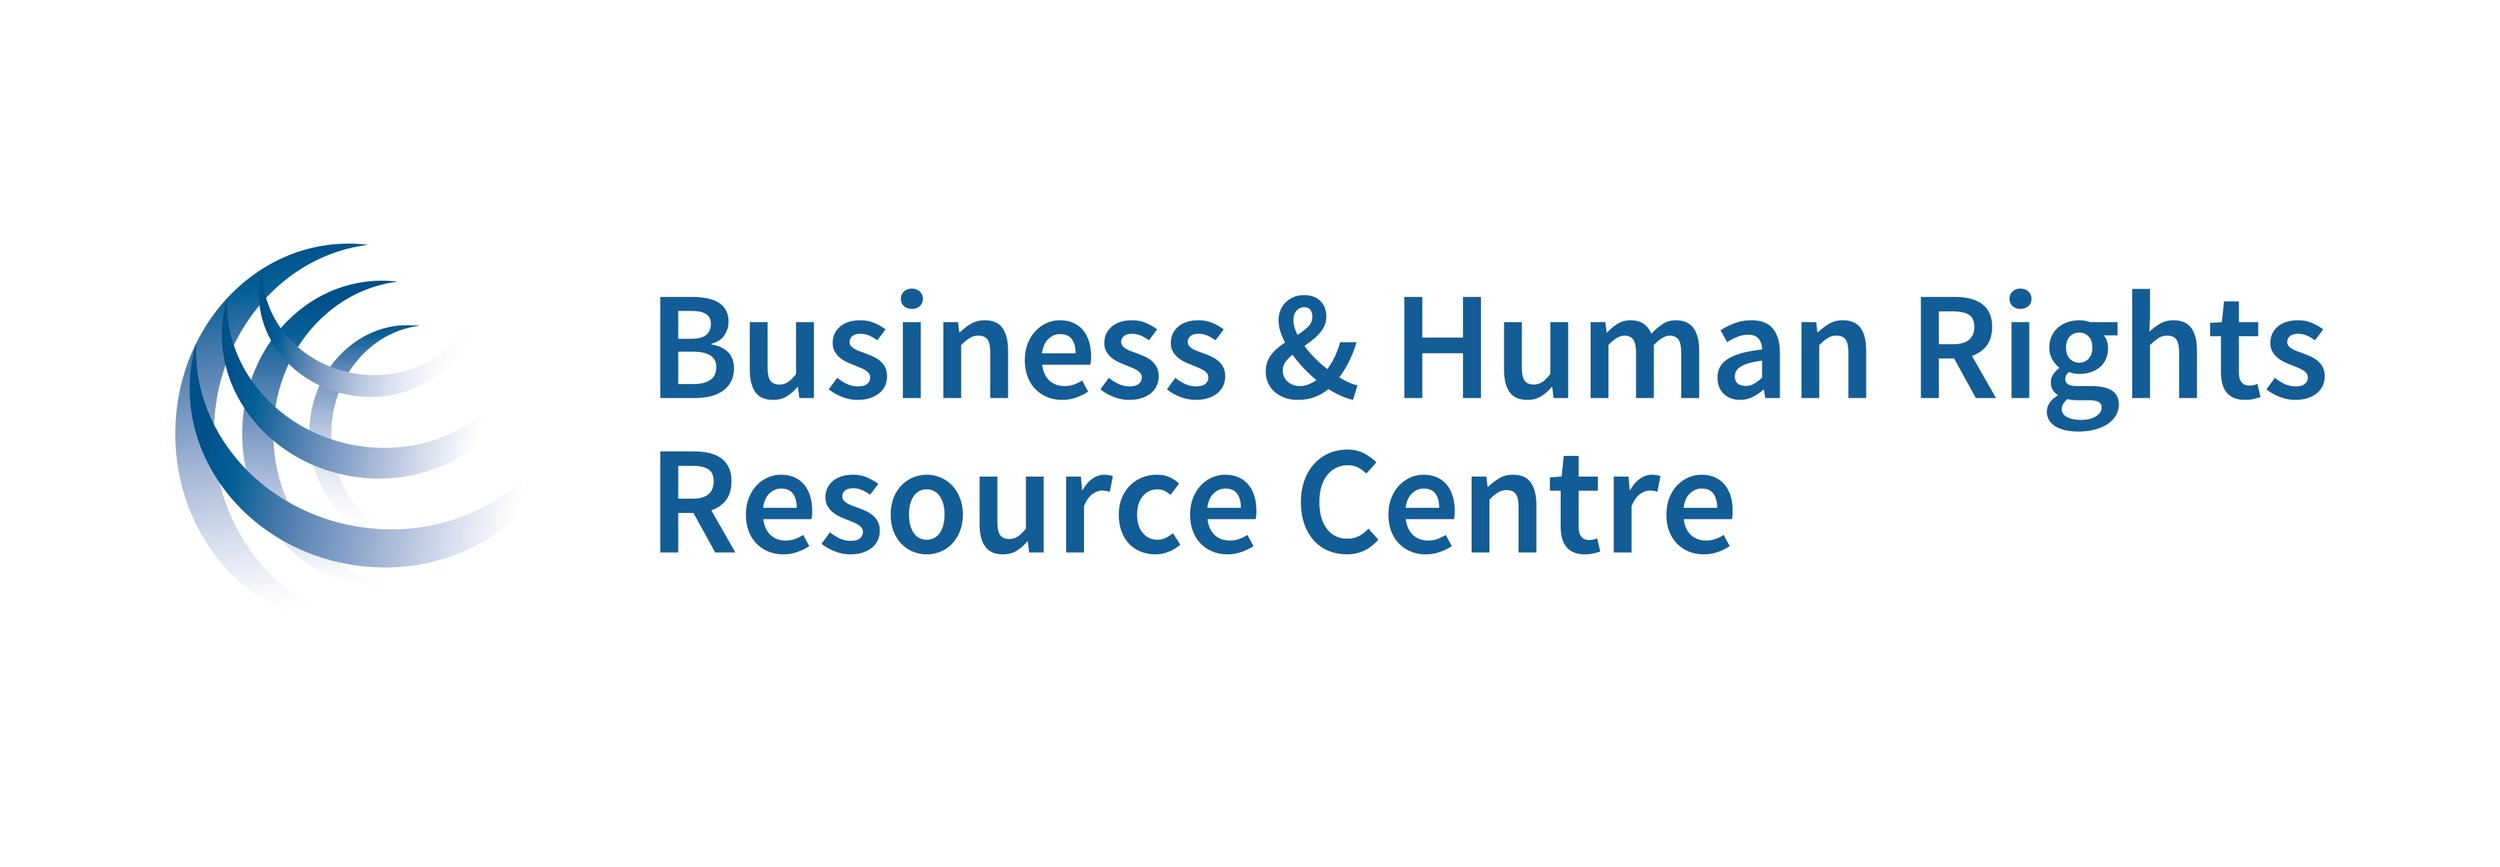 BHRRC Logo.jpg